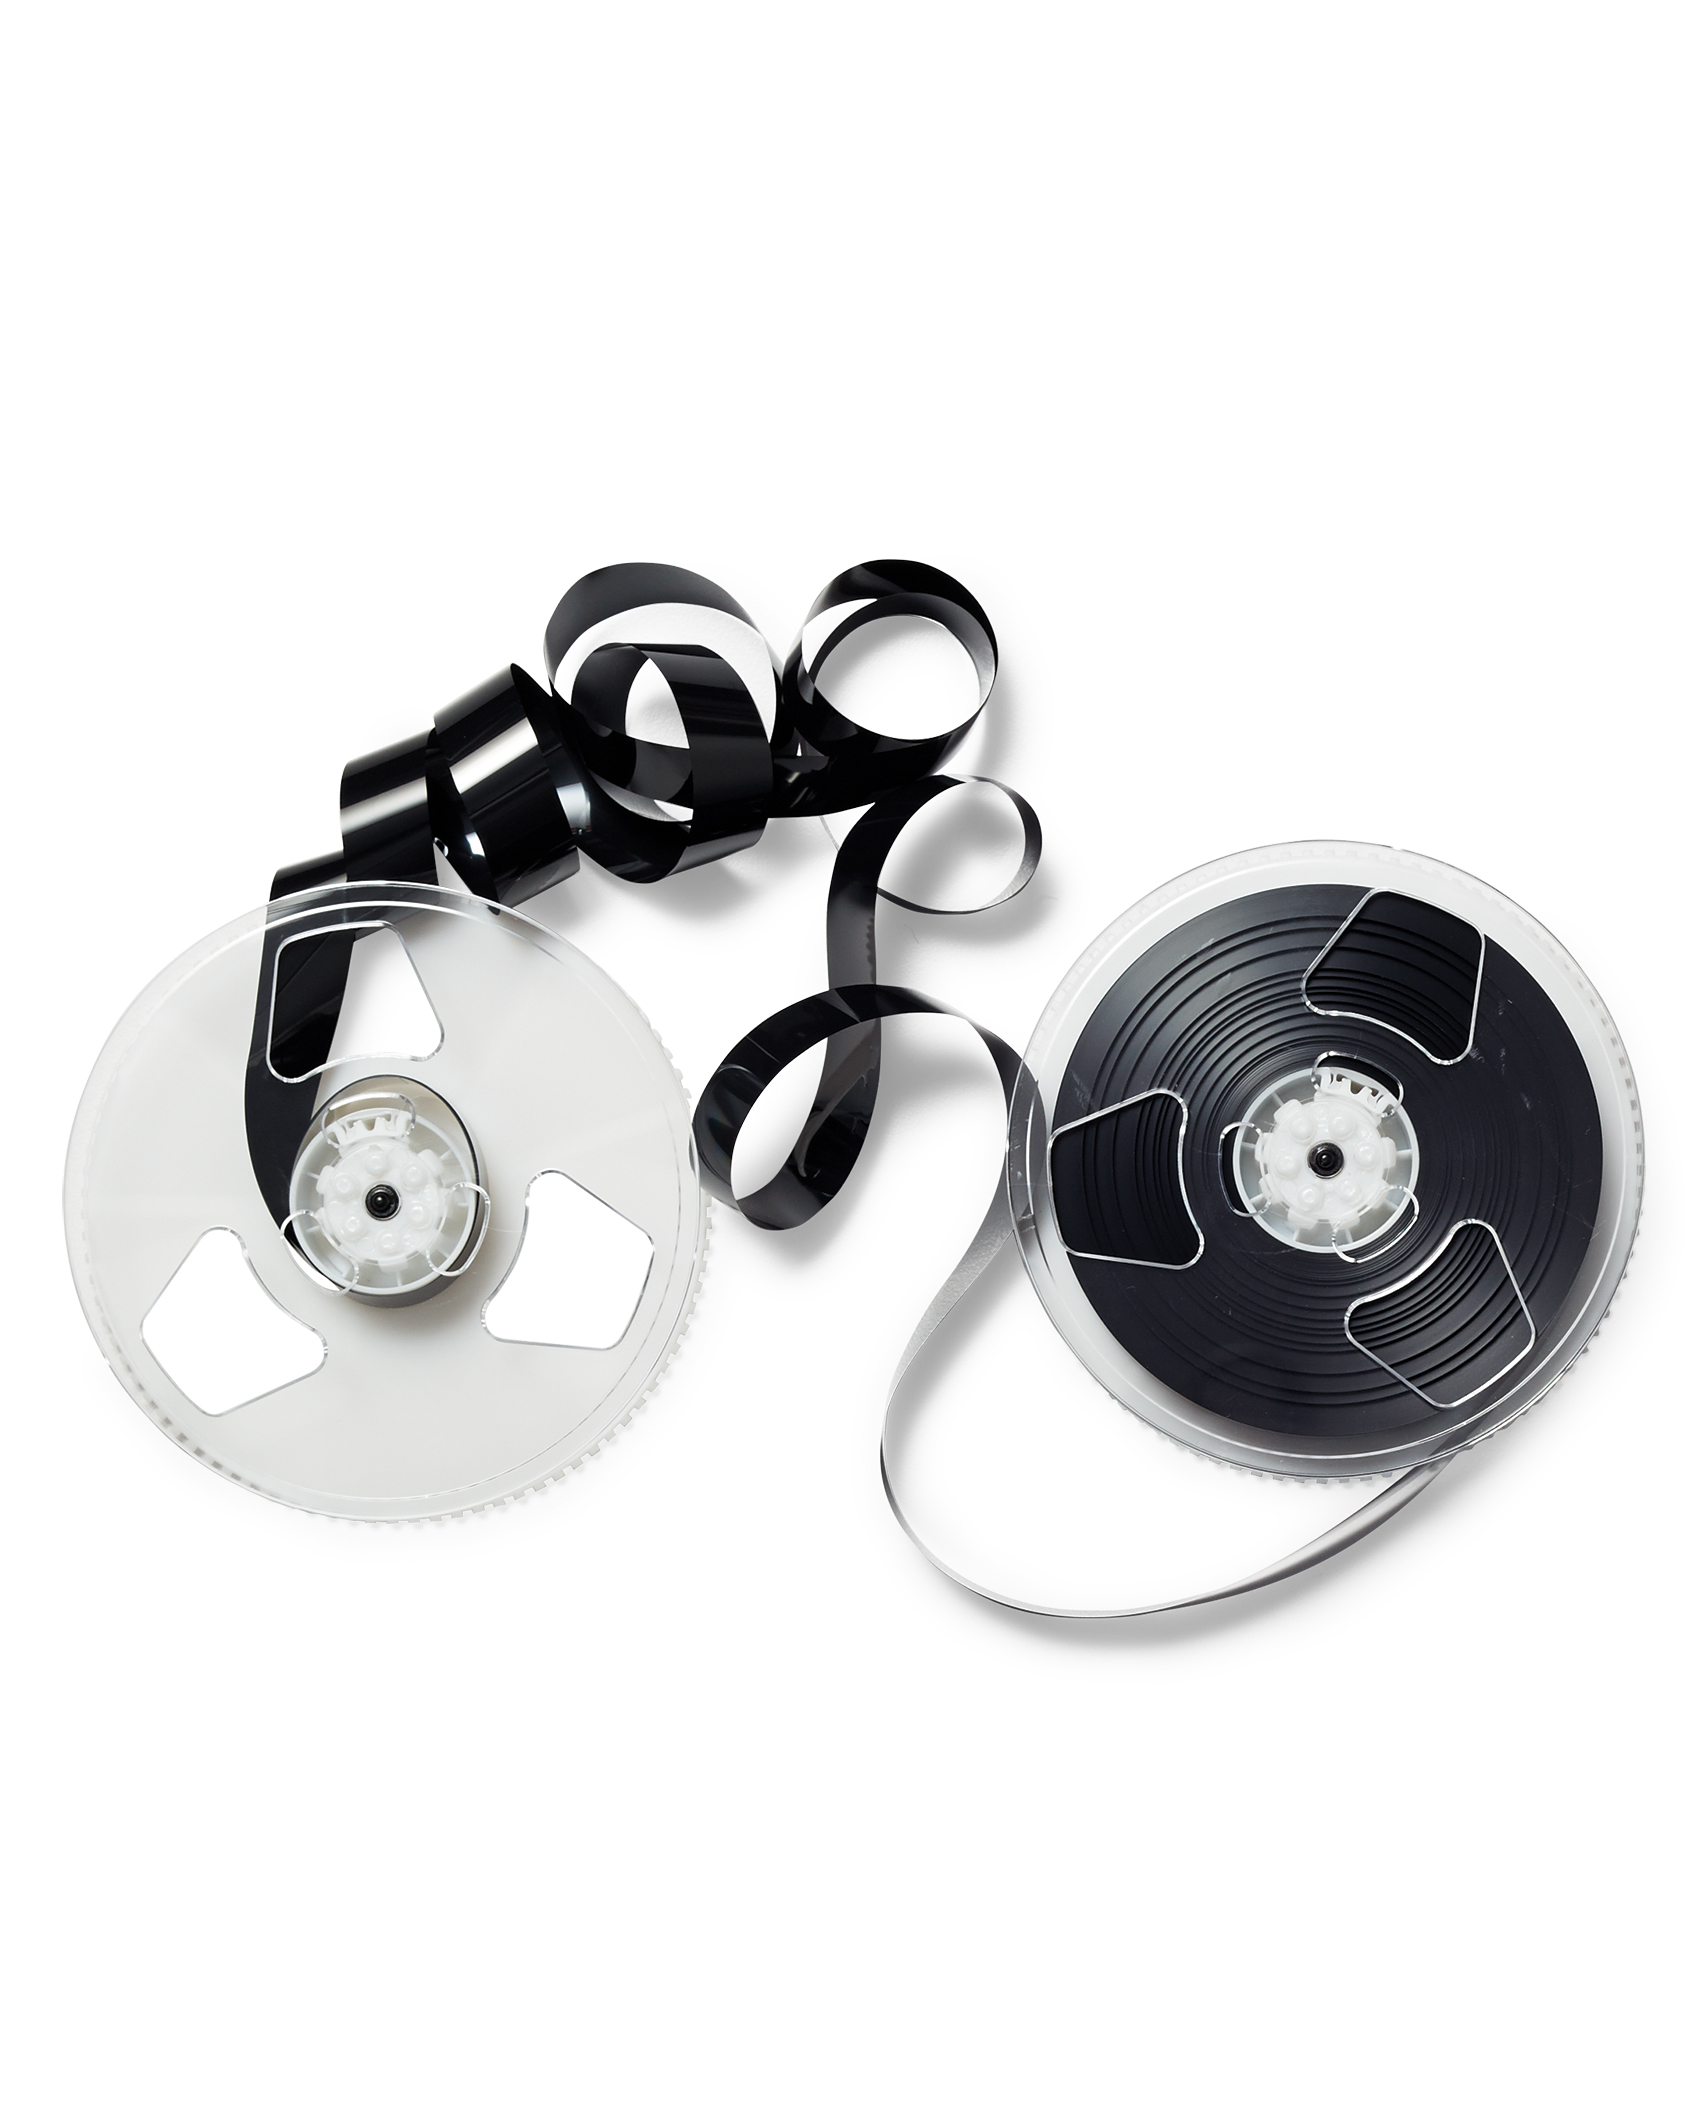 video-tape-266-d111756.jpg